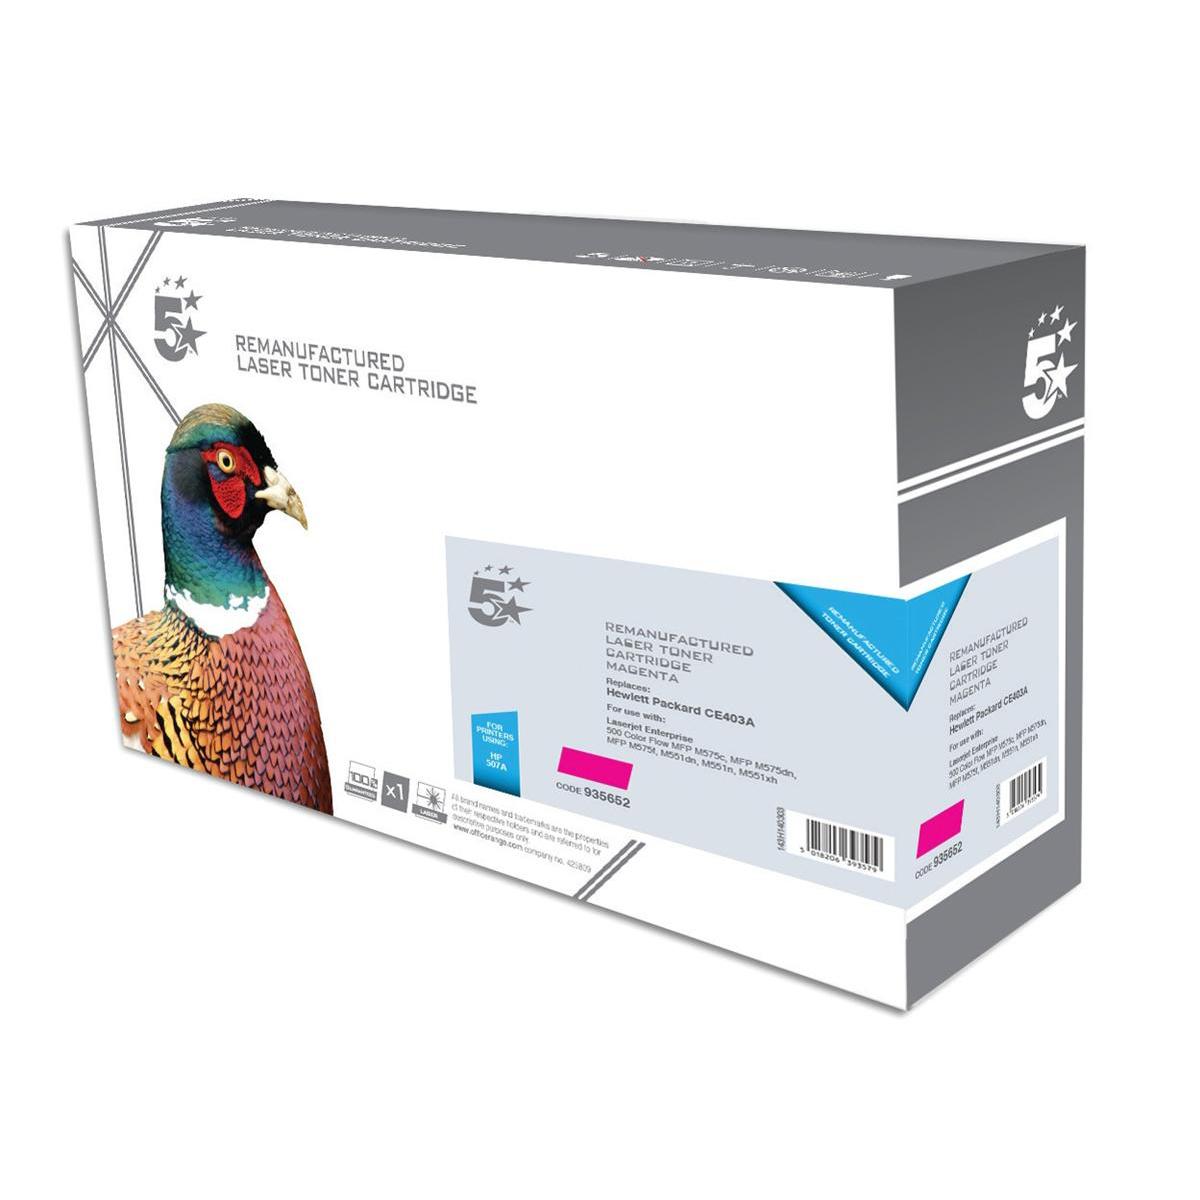 5 Star Office Remanufactured Laser Toner Cartridge 6000pp Magenta [HP 507A CE403A Alternative]